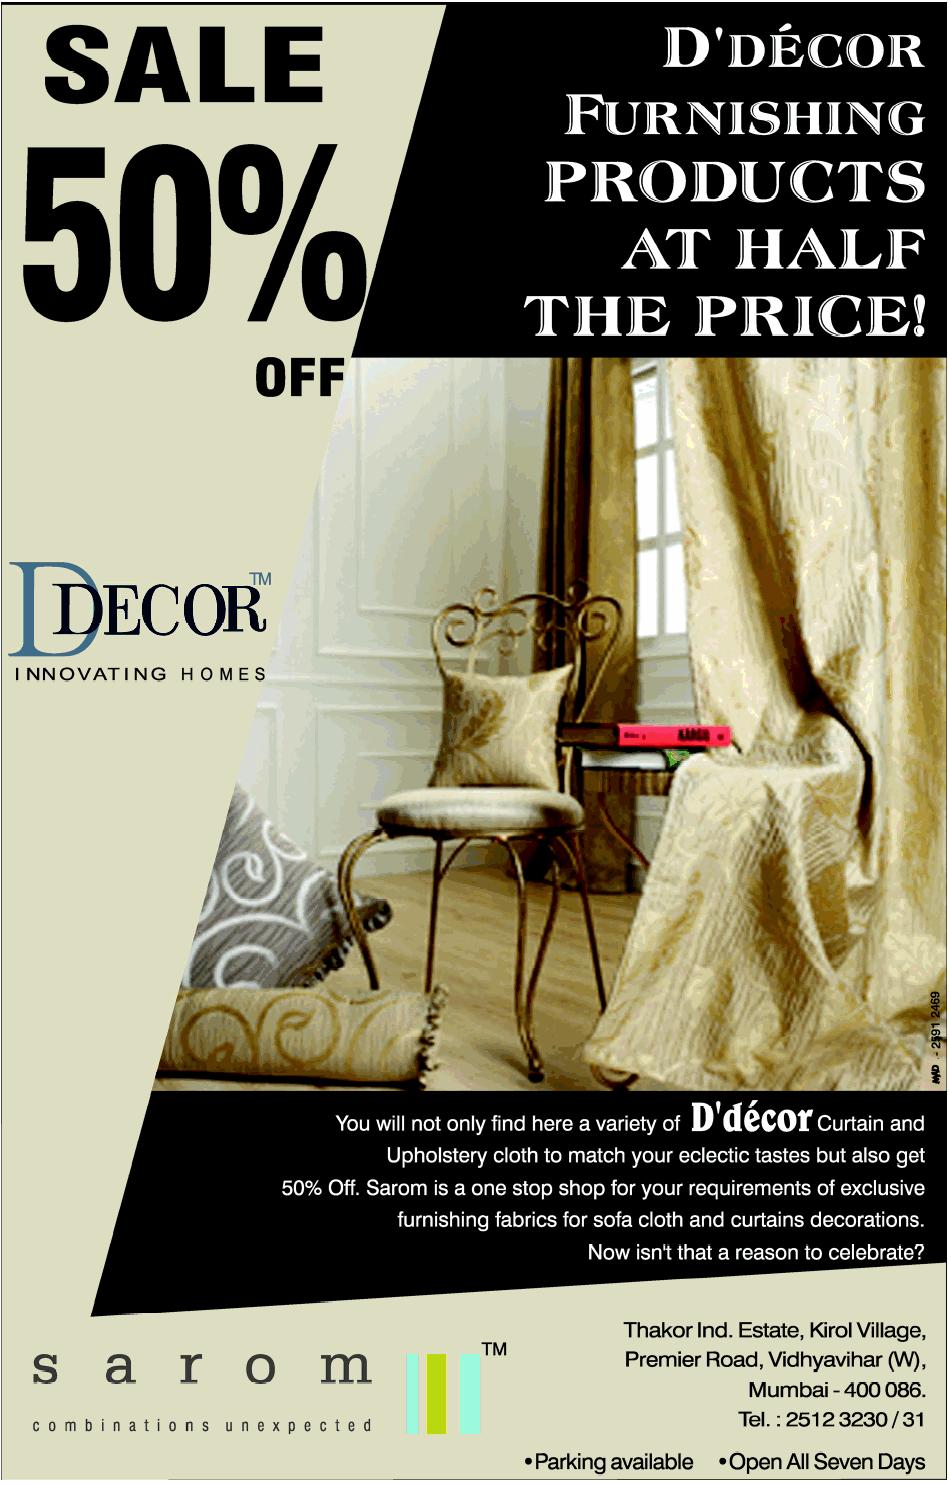 D decor furnishings sale 50 off mumbai saleraja for D deco